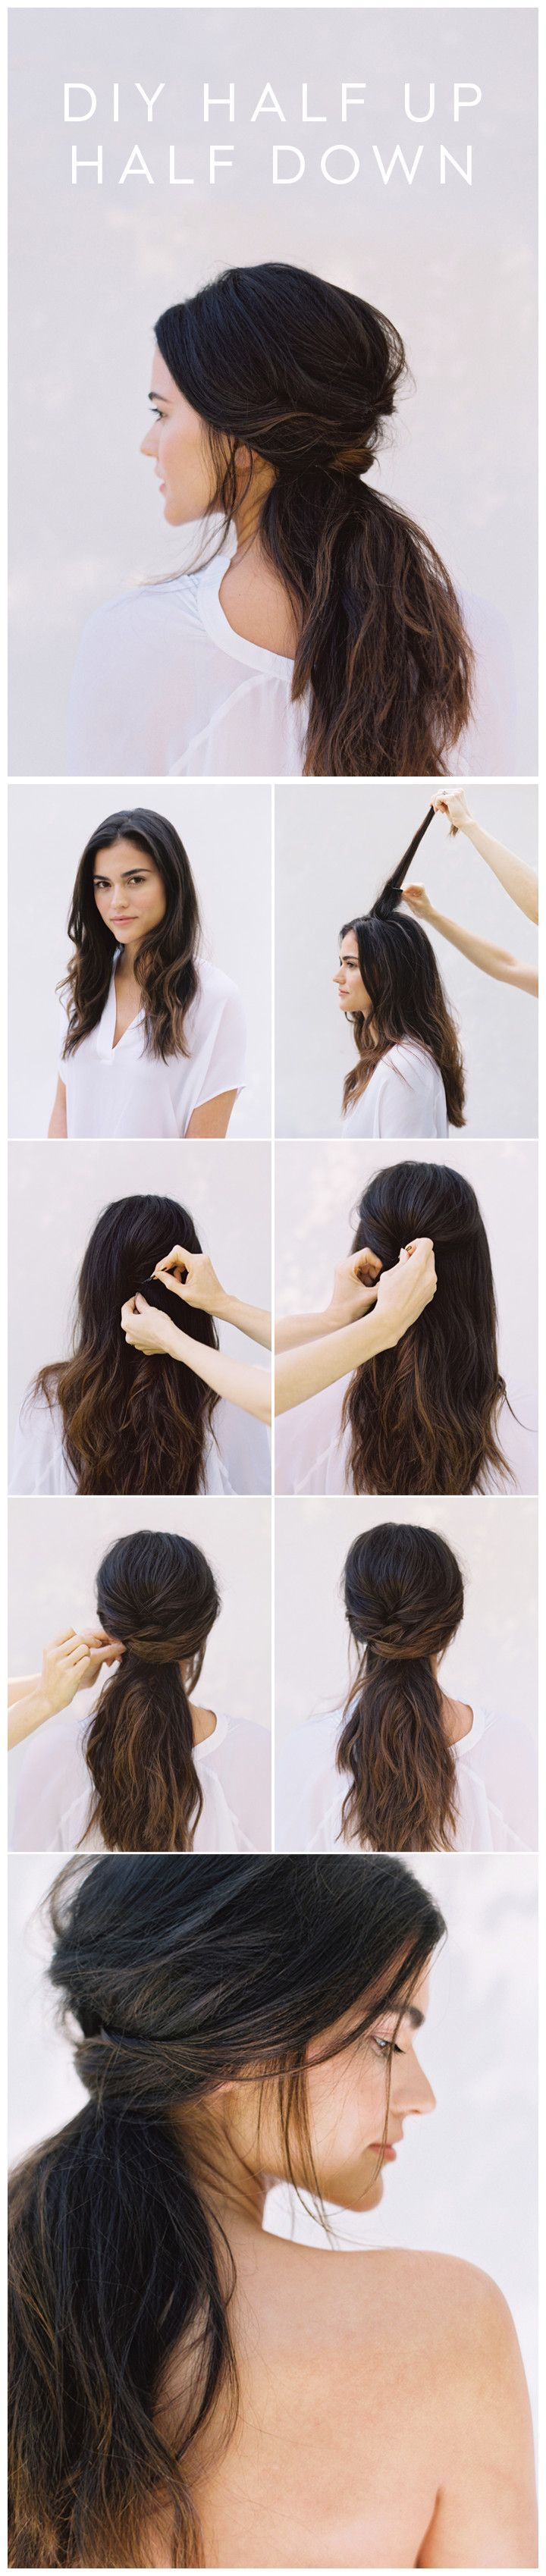 DIY HALF UP HALF DOWN HAIR